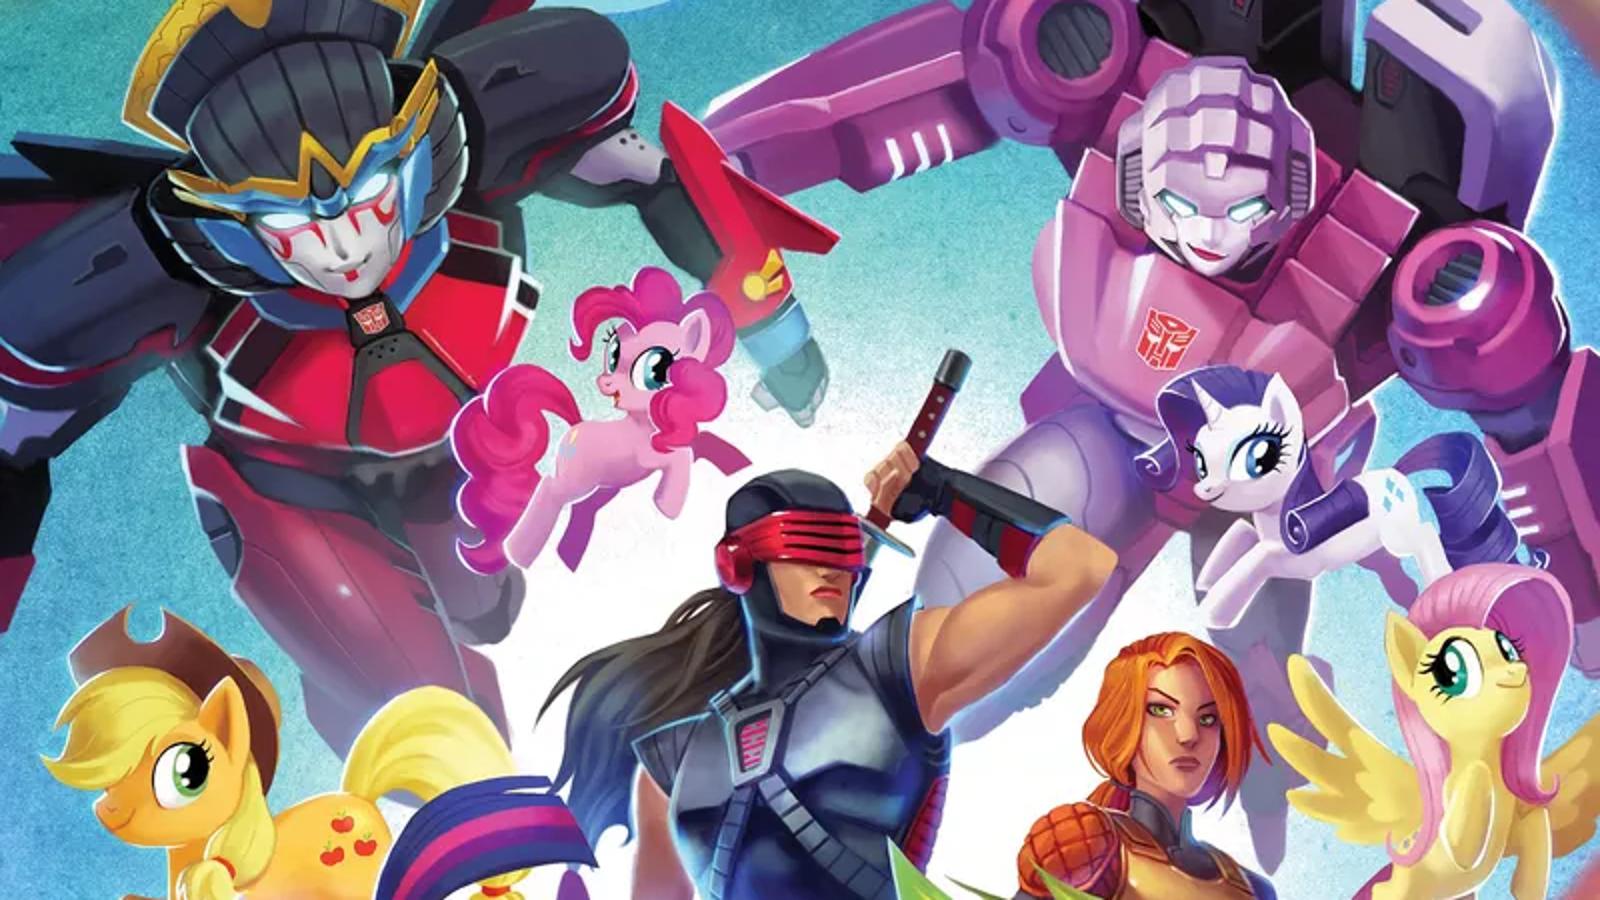 IDW's Next Hasbro Comic Celebrates the Female Icons of Toys